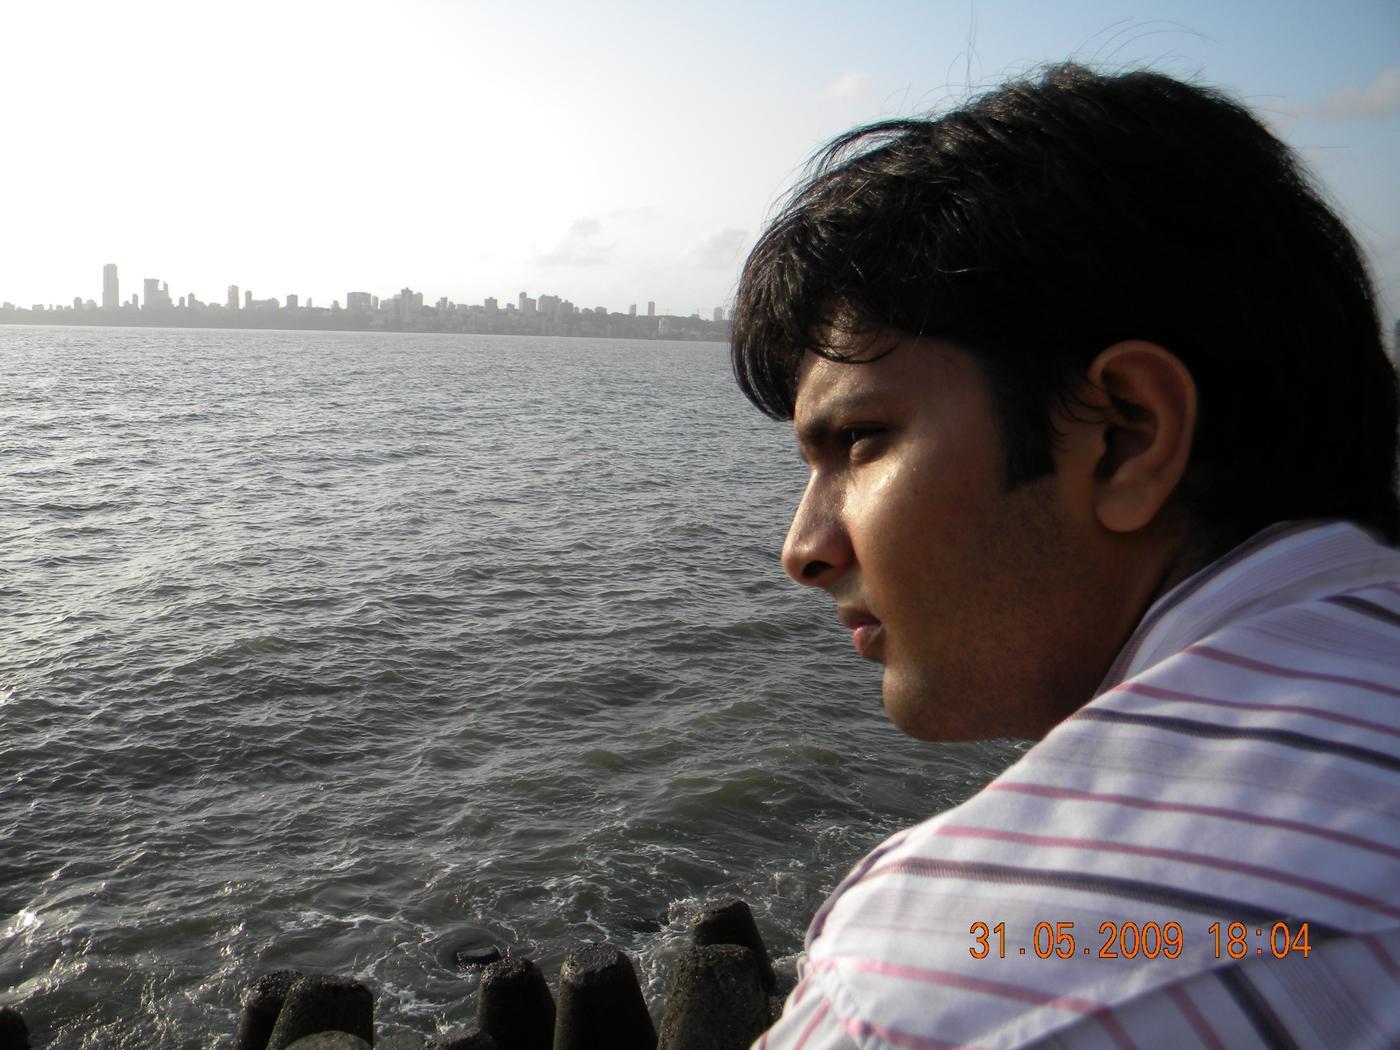 Jeet Dholakia